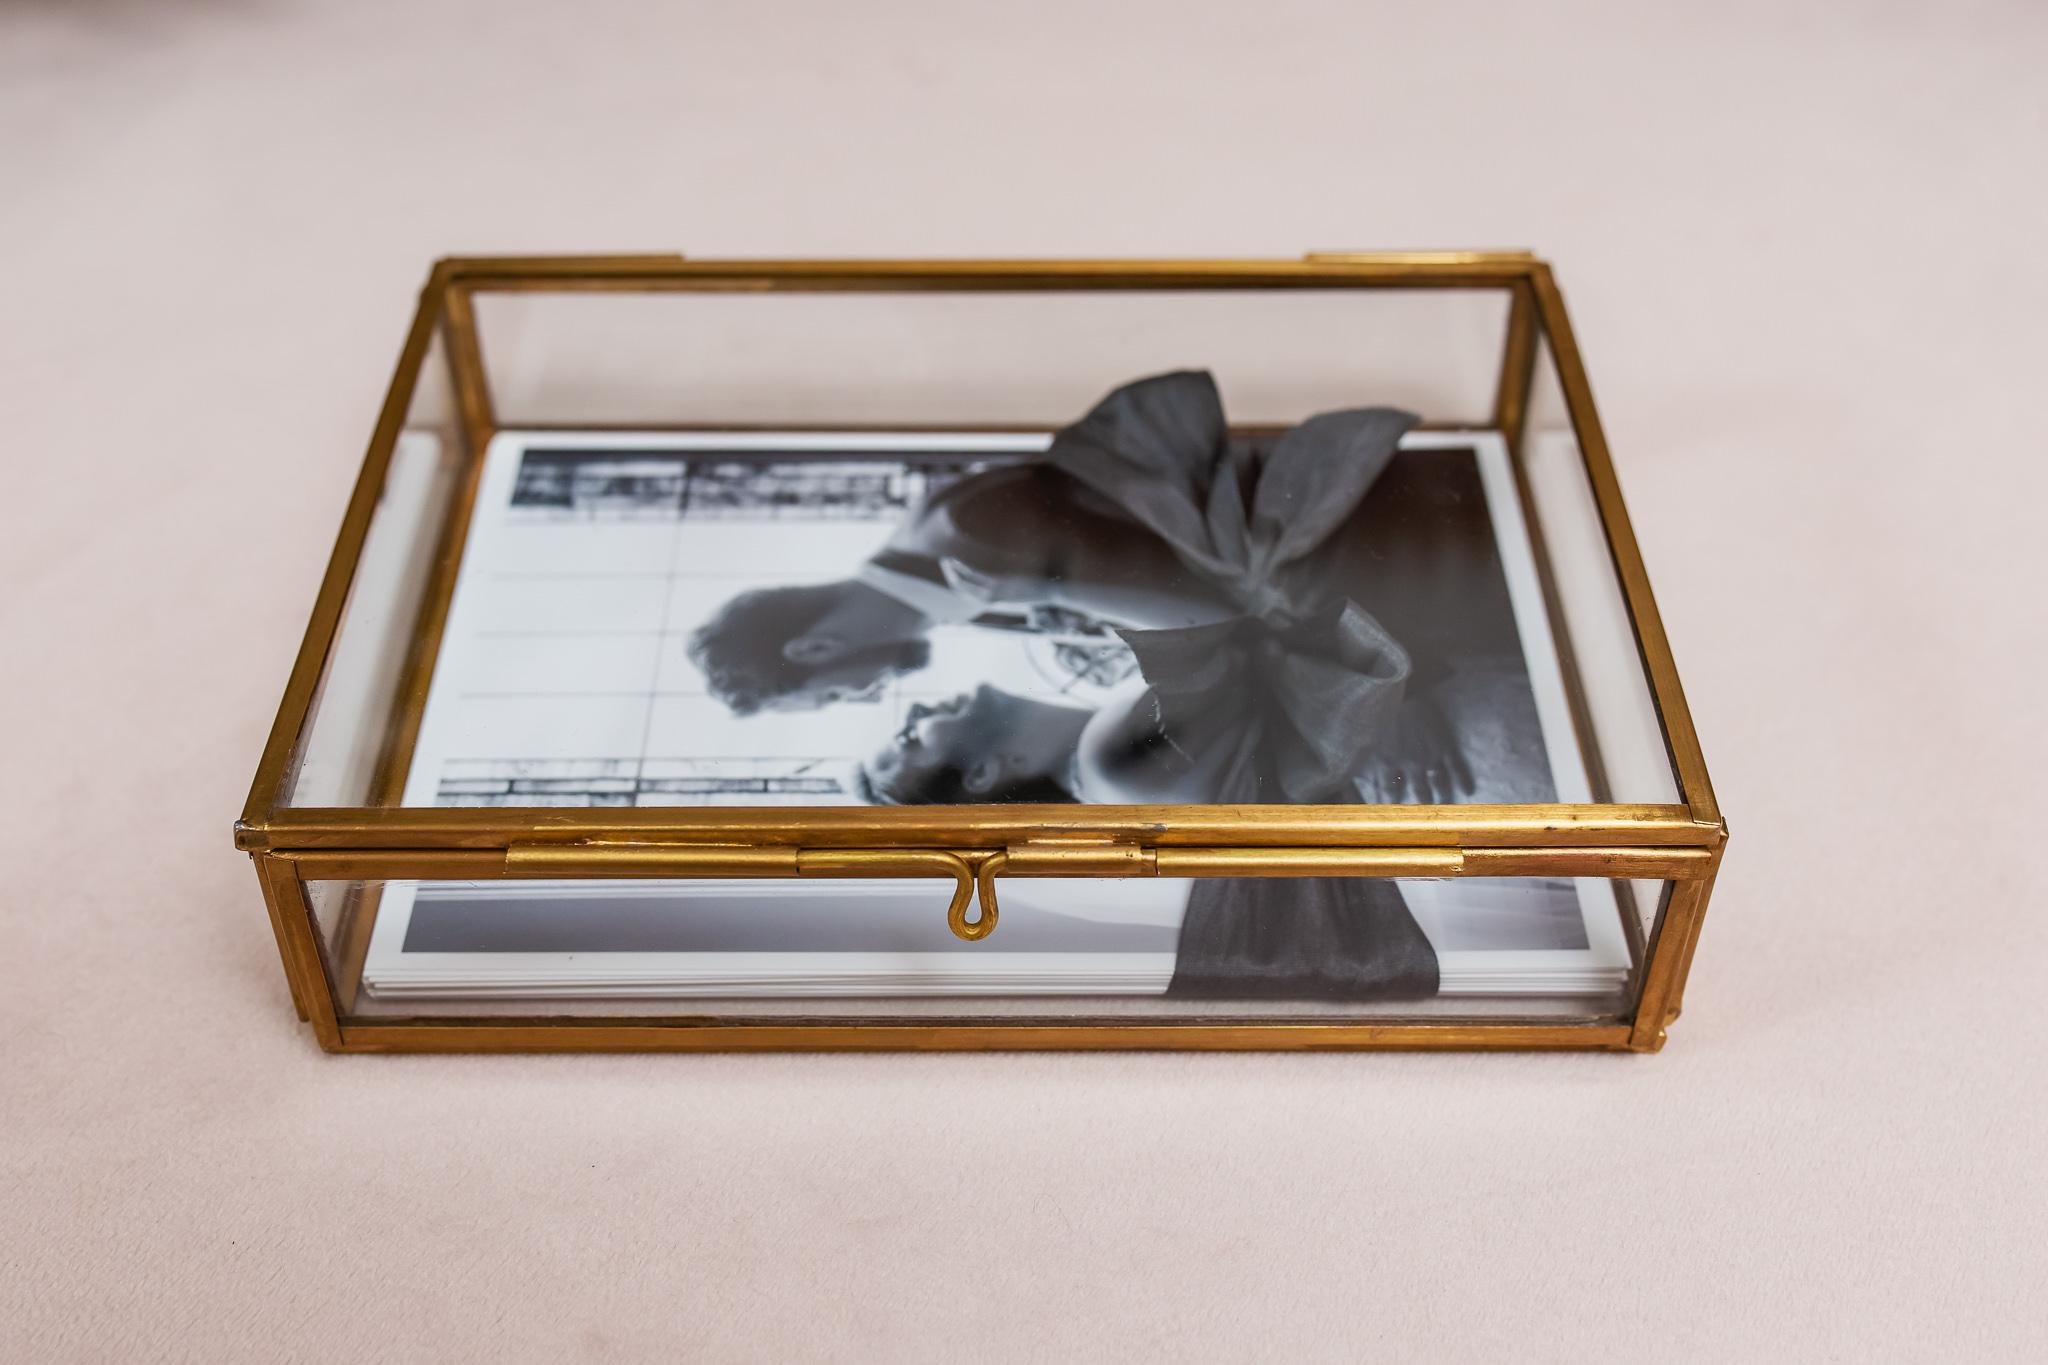 Glass and metal print box with fine art wedding prints